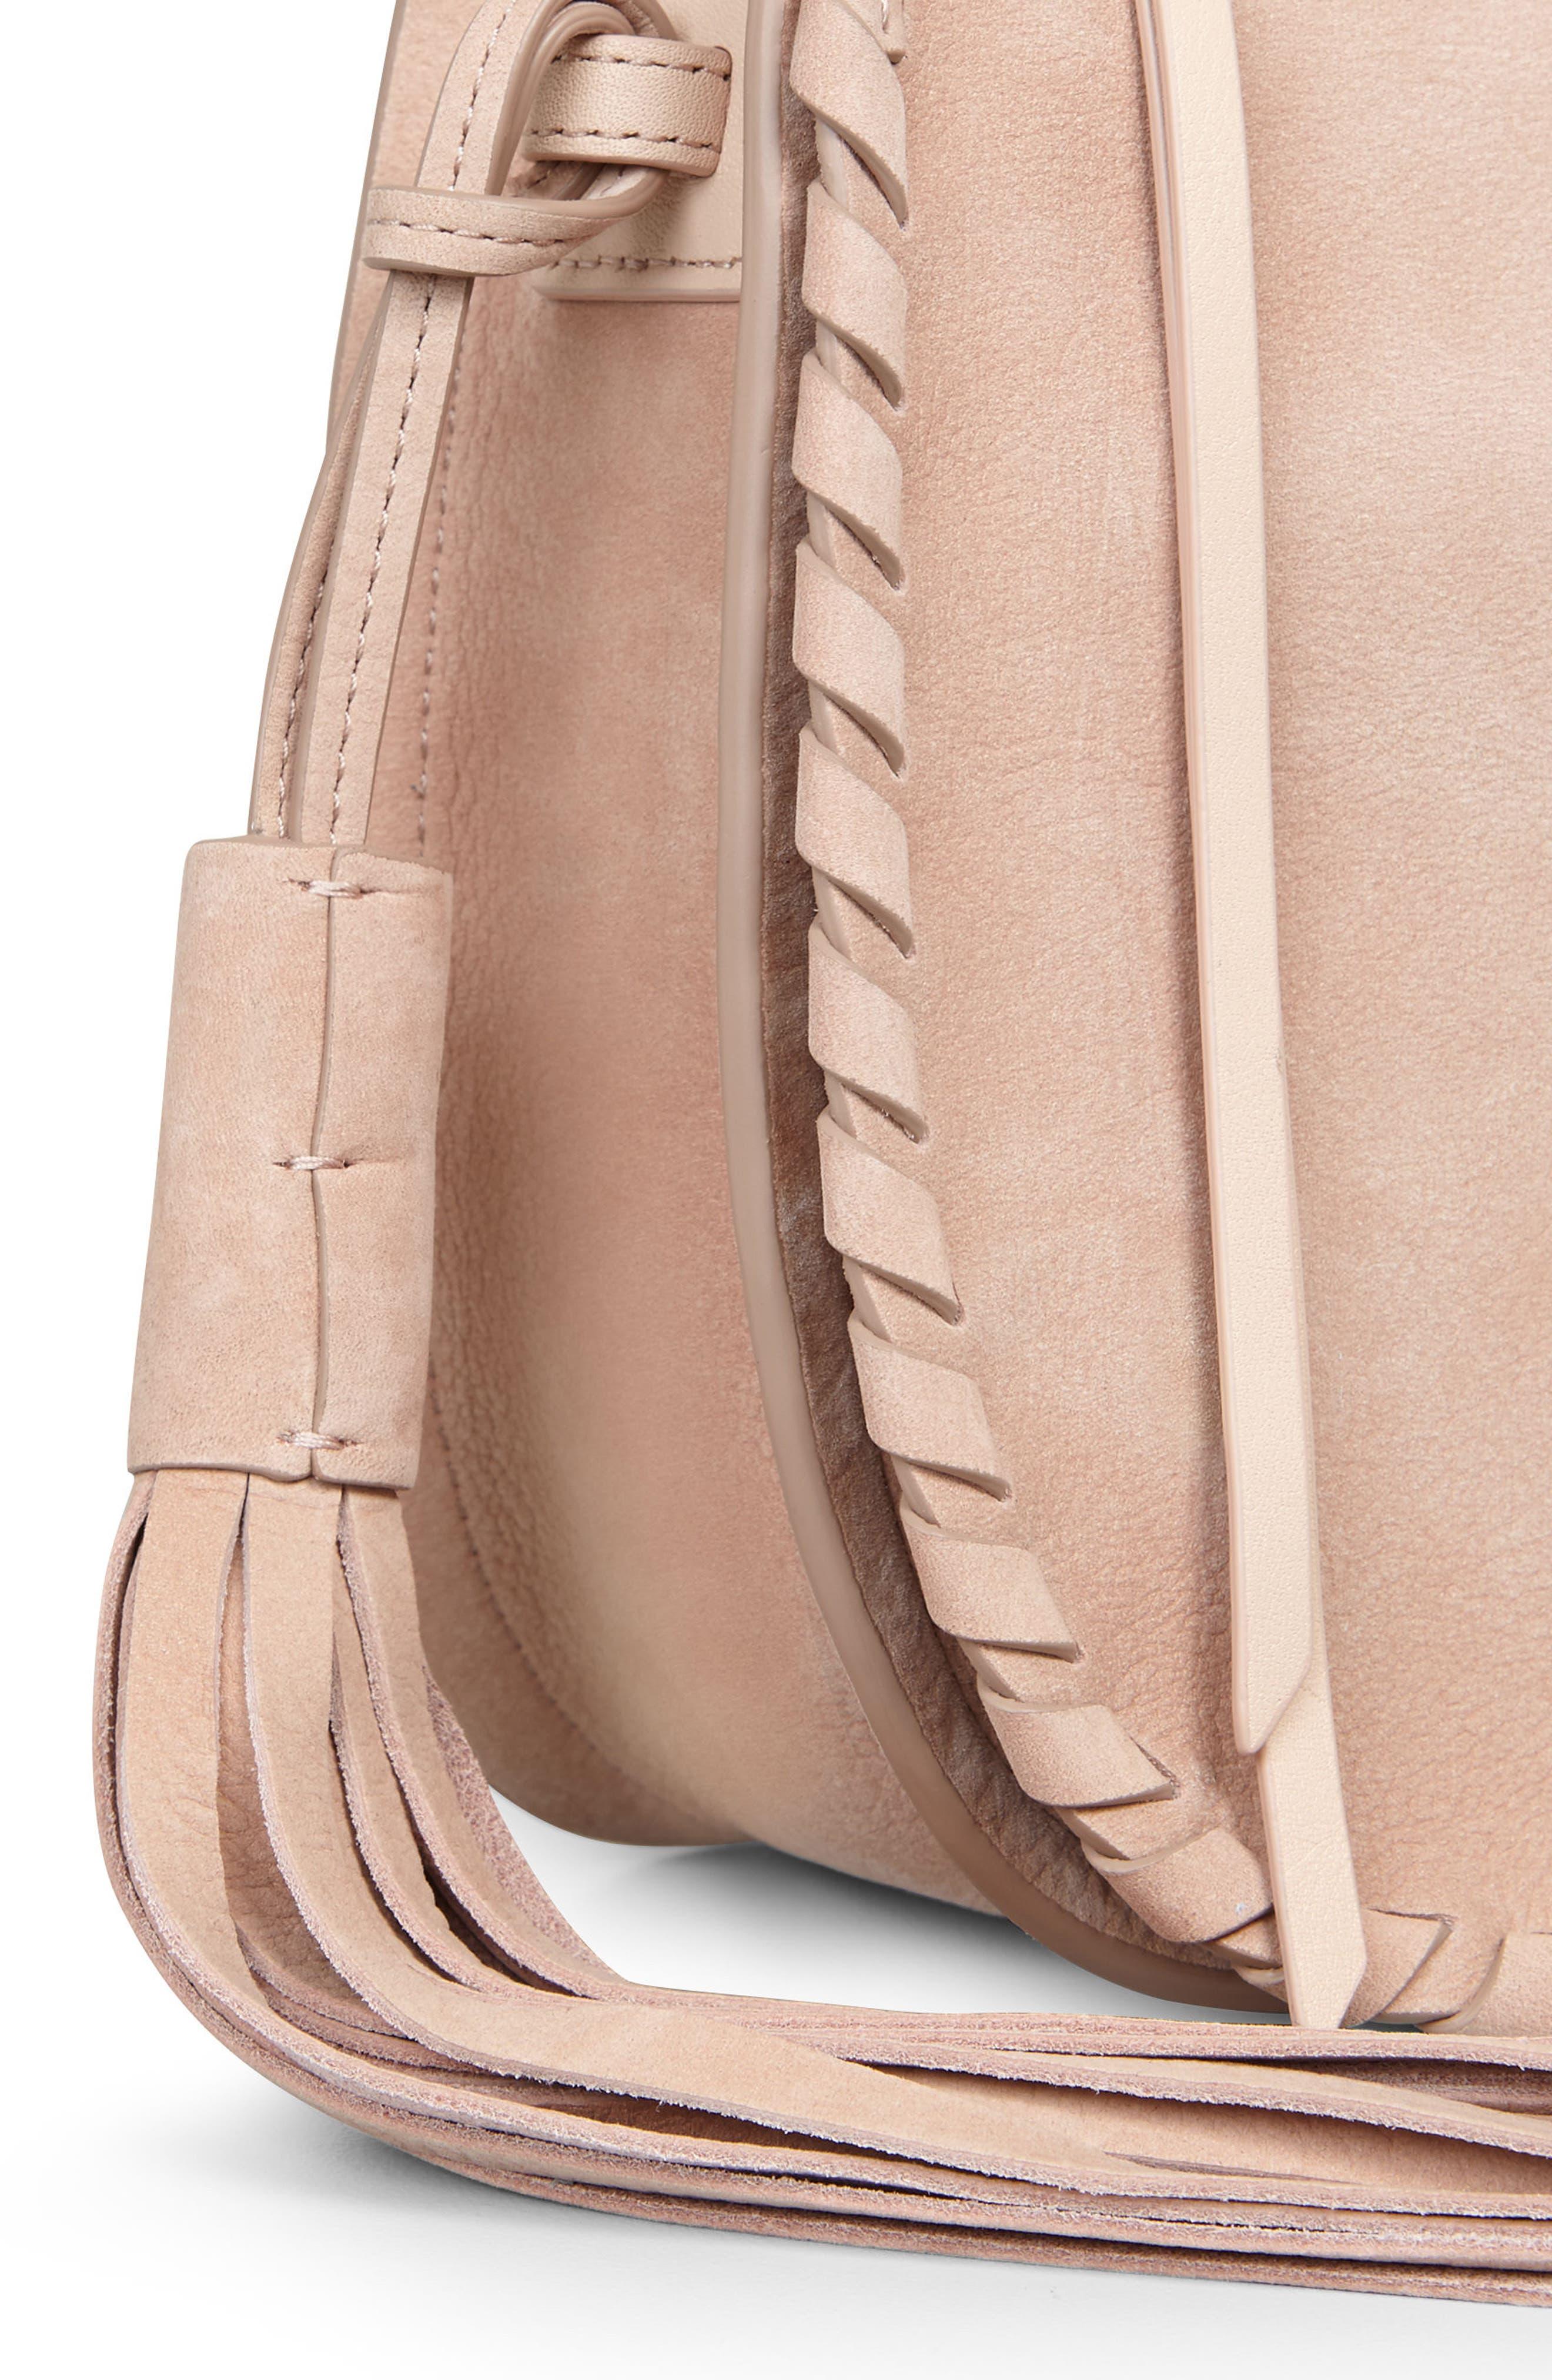 Mori Suede Crossbody Bag,                             Alternate thumbnail 5, color,                             Nude Pink